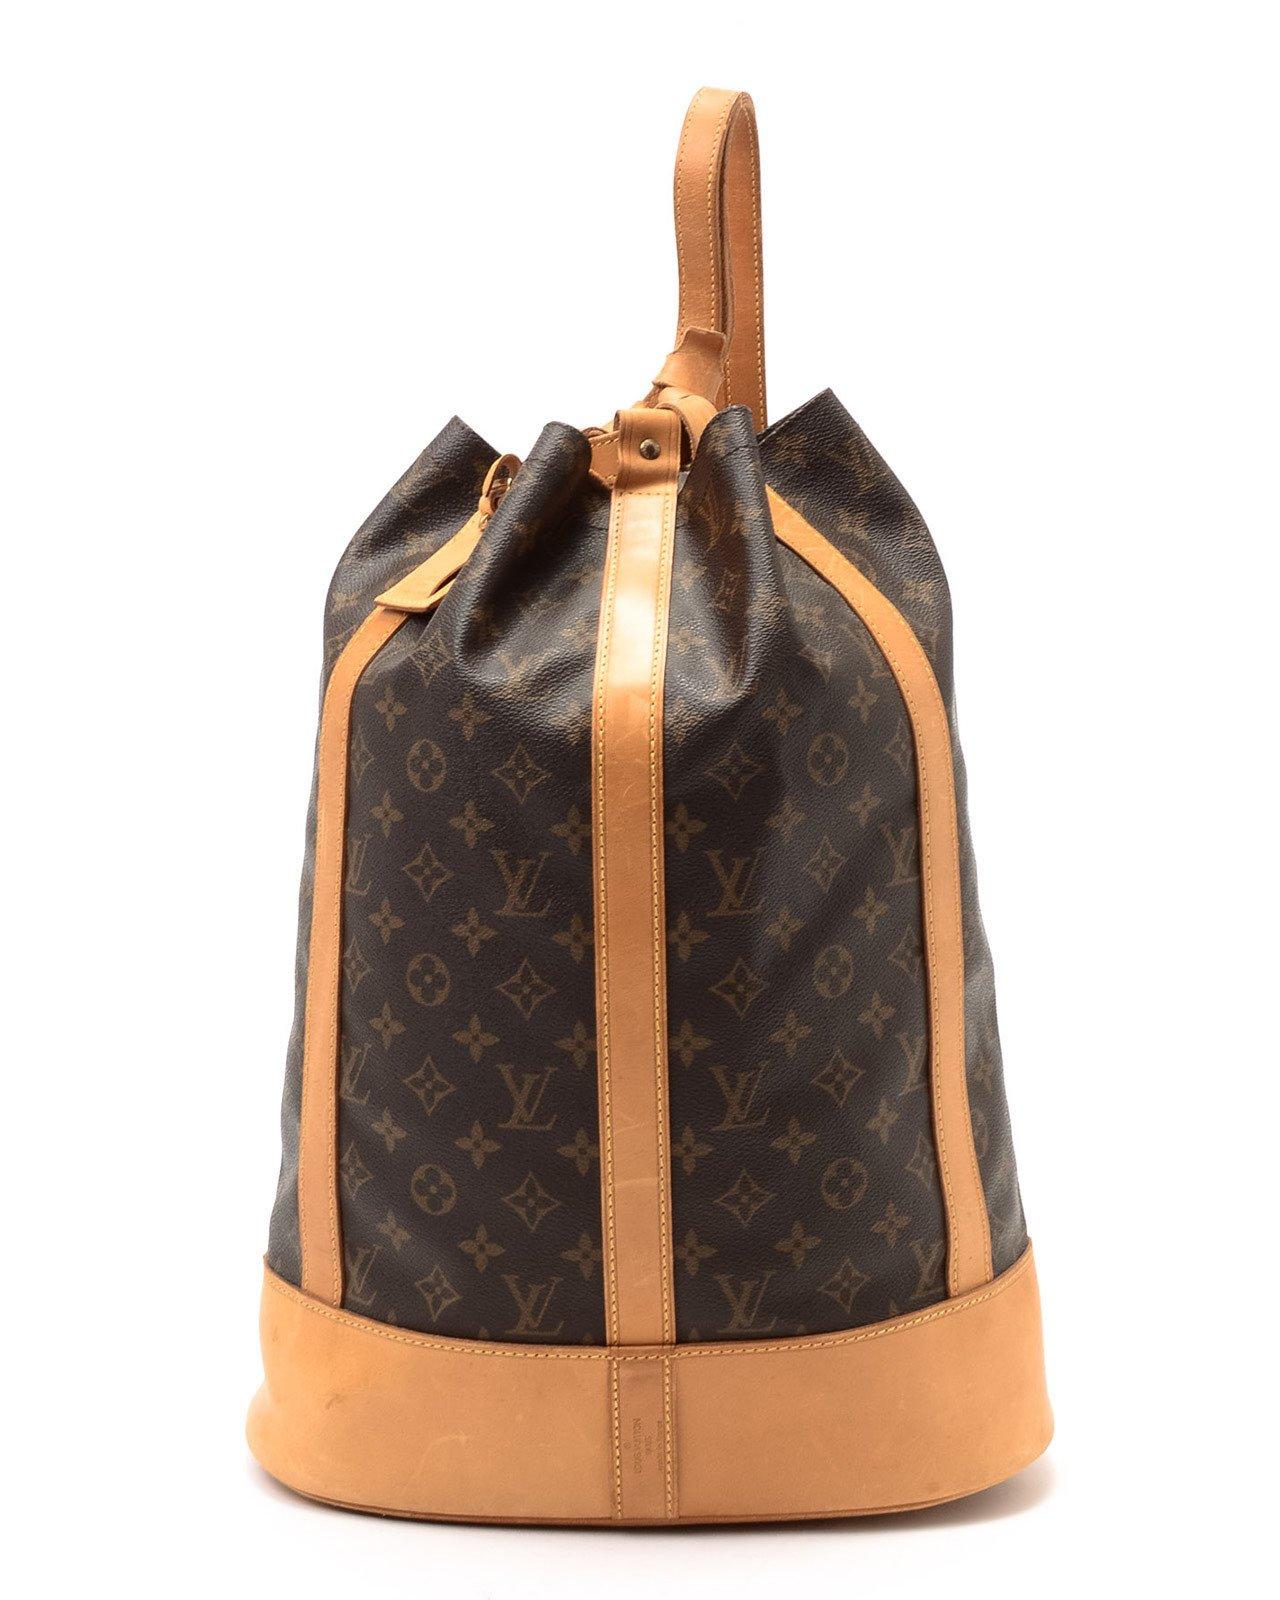 3fabb2b5452f Lyst - Louis Vuitton Monogram Randonnee Gm Backpack in Brown